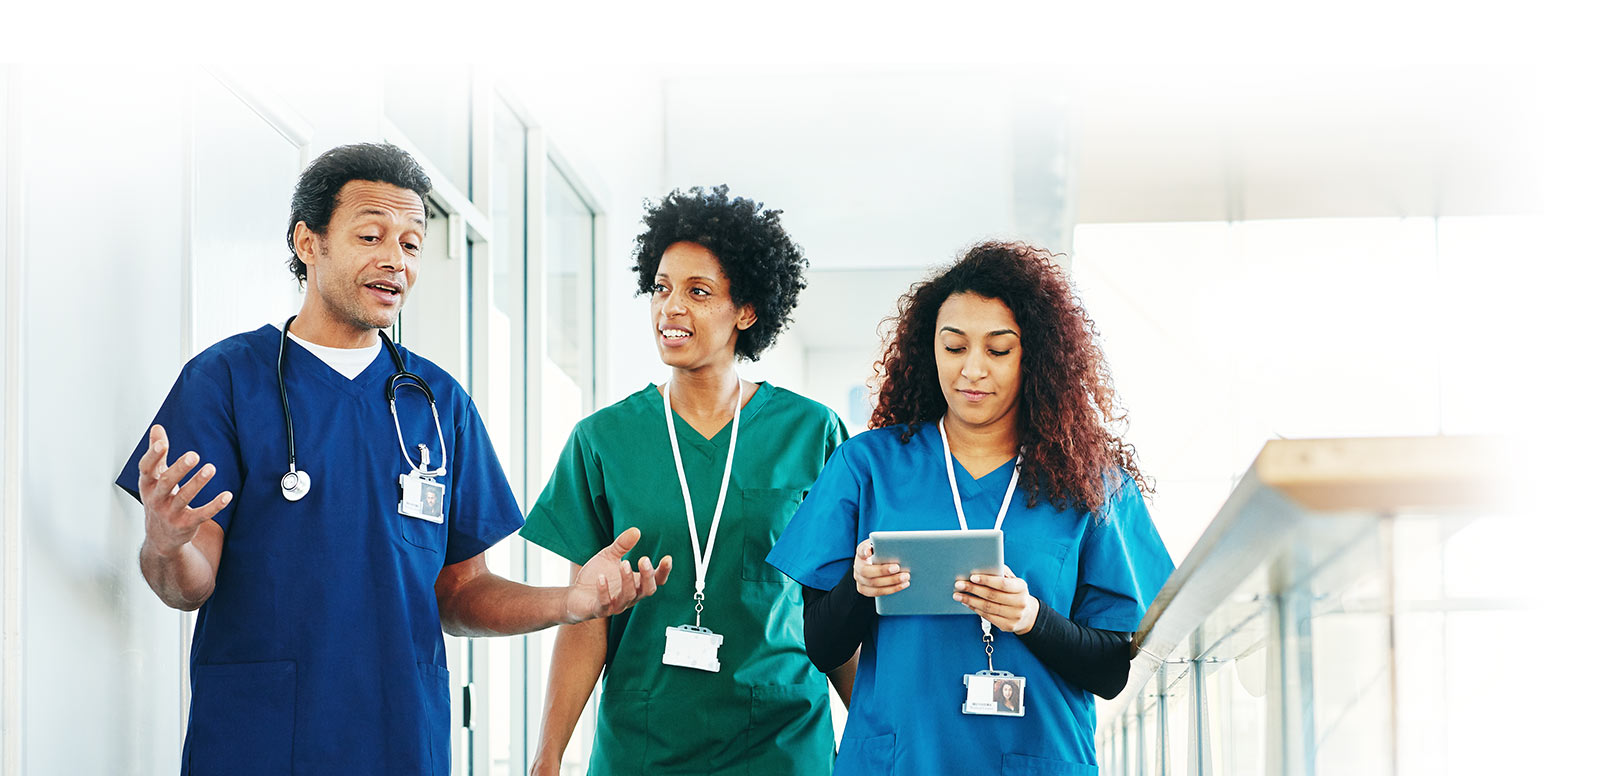 nurse staffing services hospitals